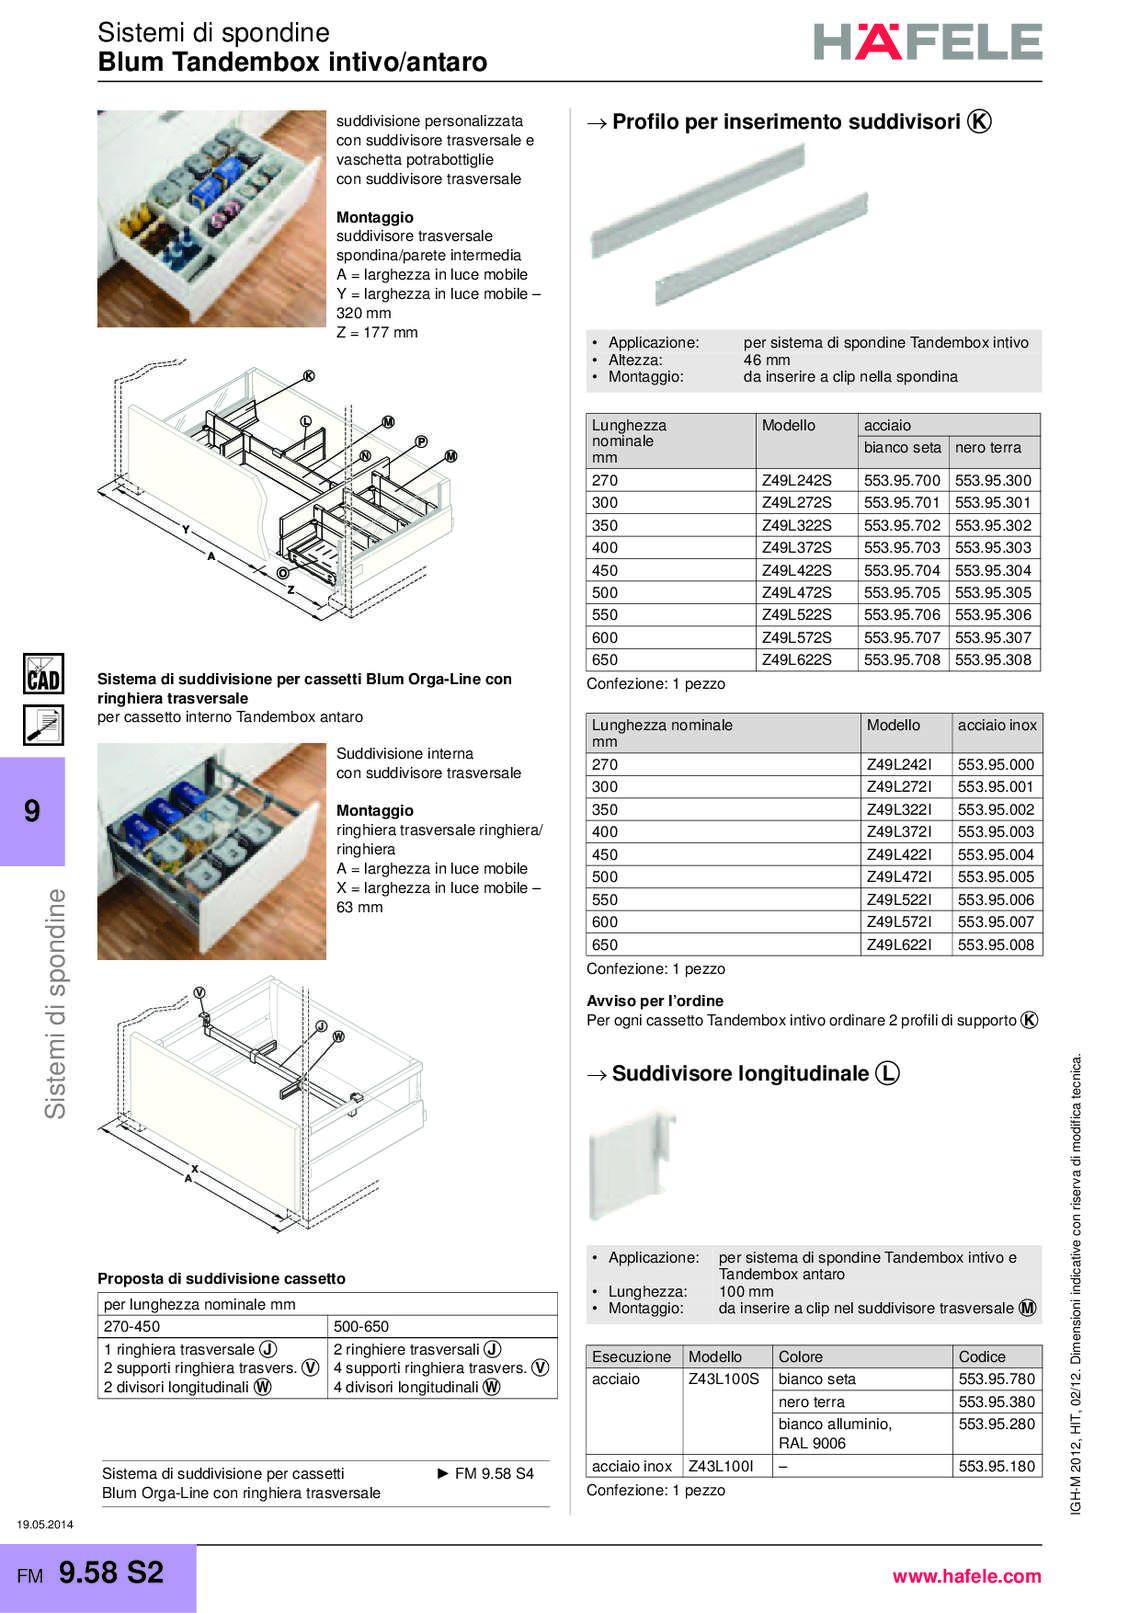 hafele-spondine-e-guide-per-mobili_40_095.jpg